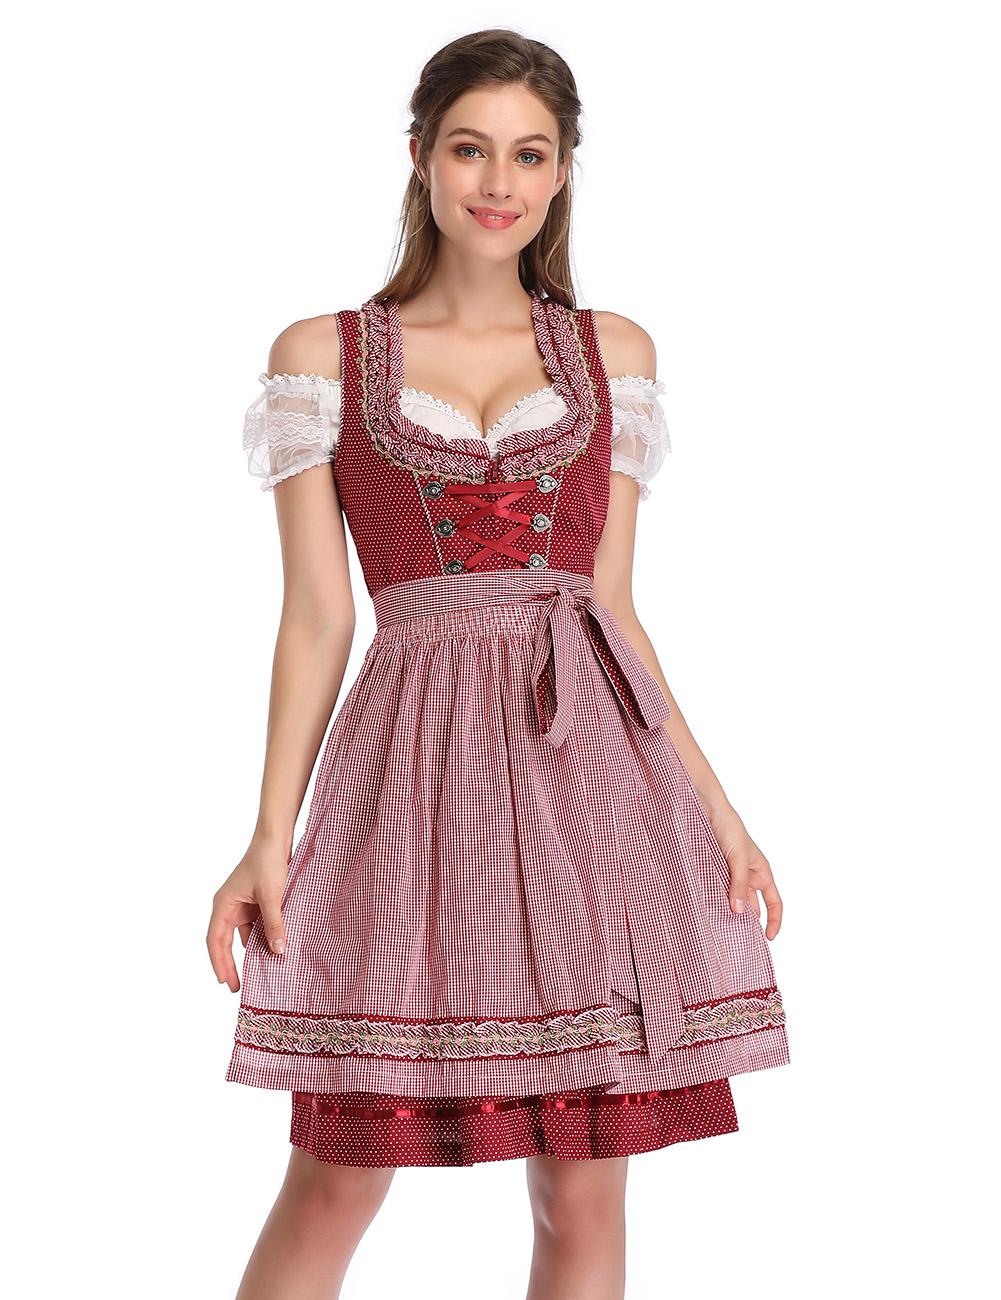 KOJOOIN Women's Vintage 3-Piece Embroidery Floral German Party Oktoberfest Dirndl Dress